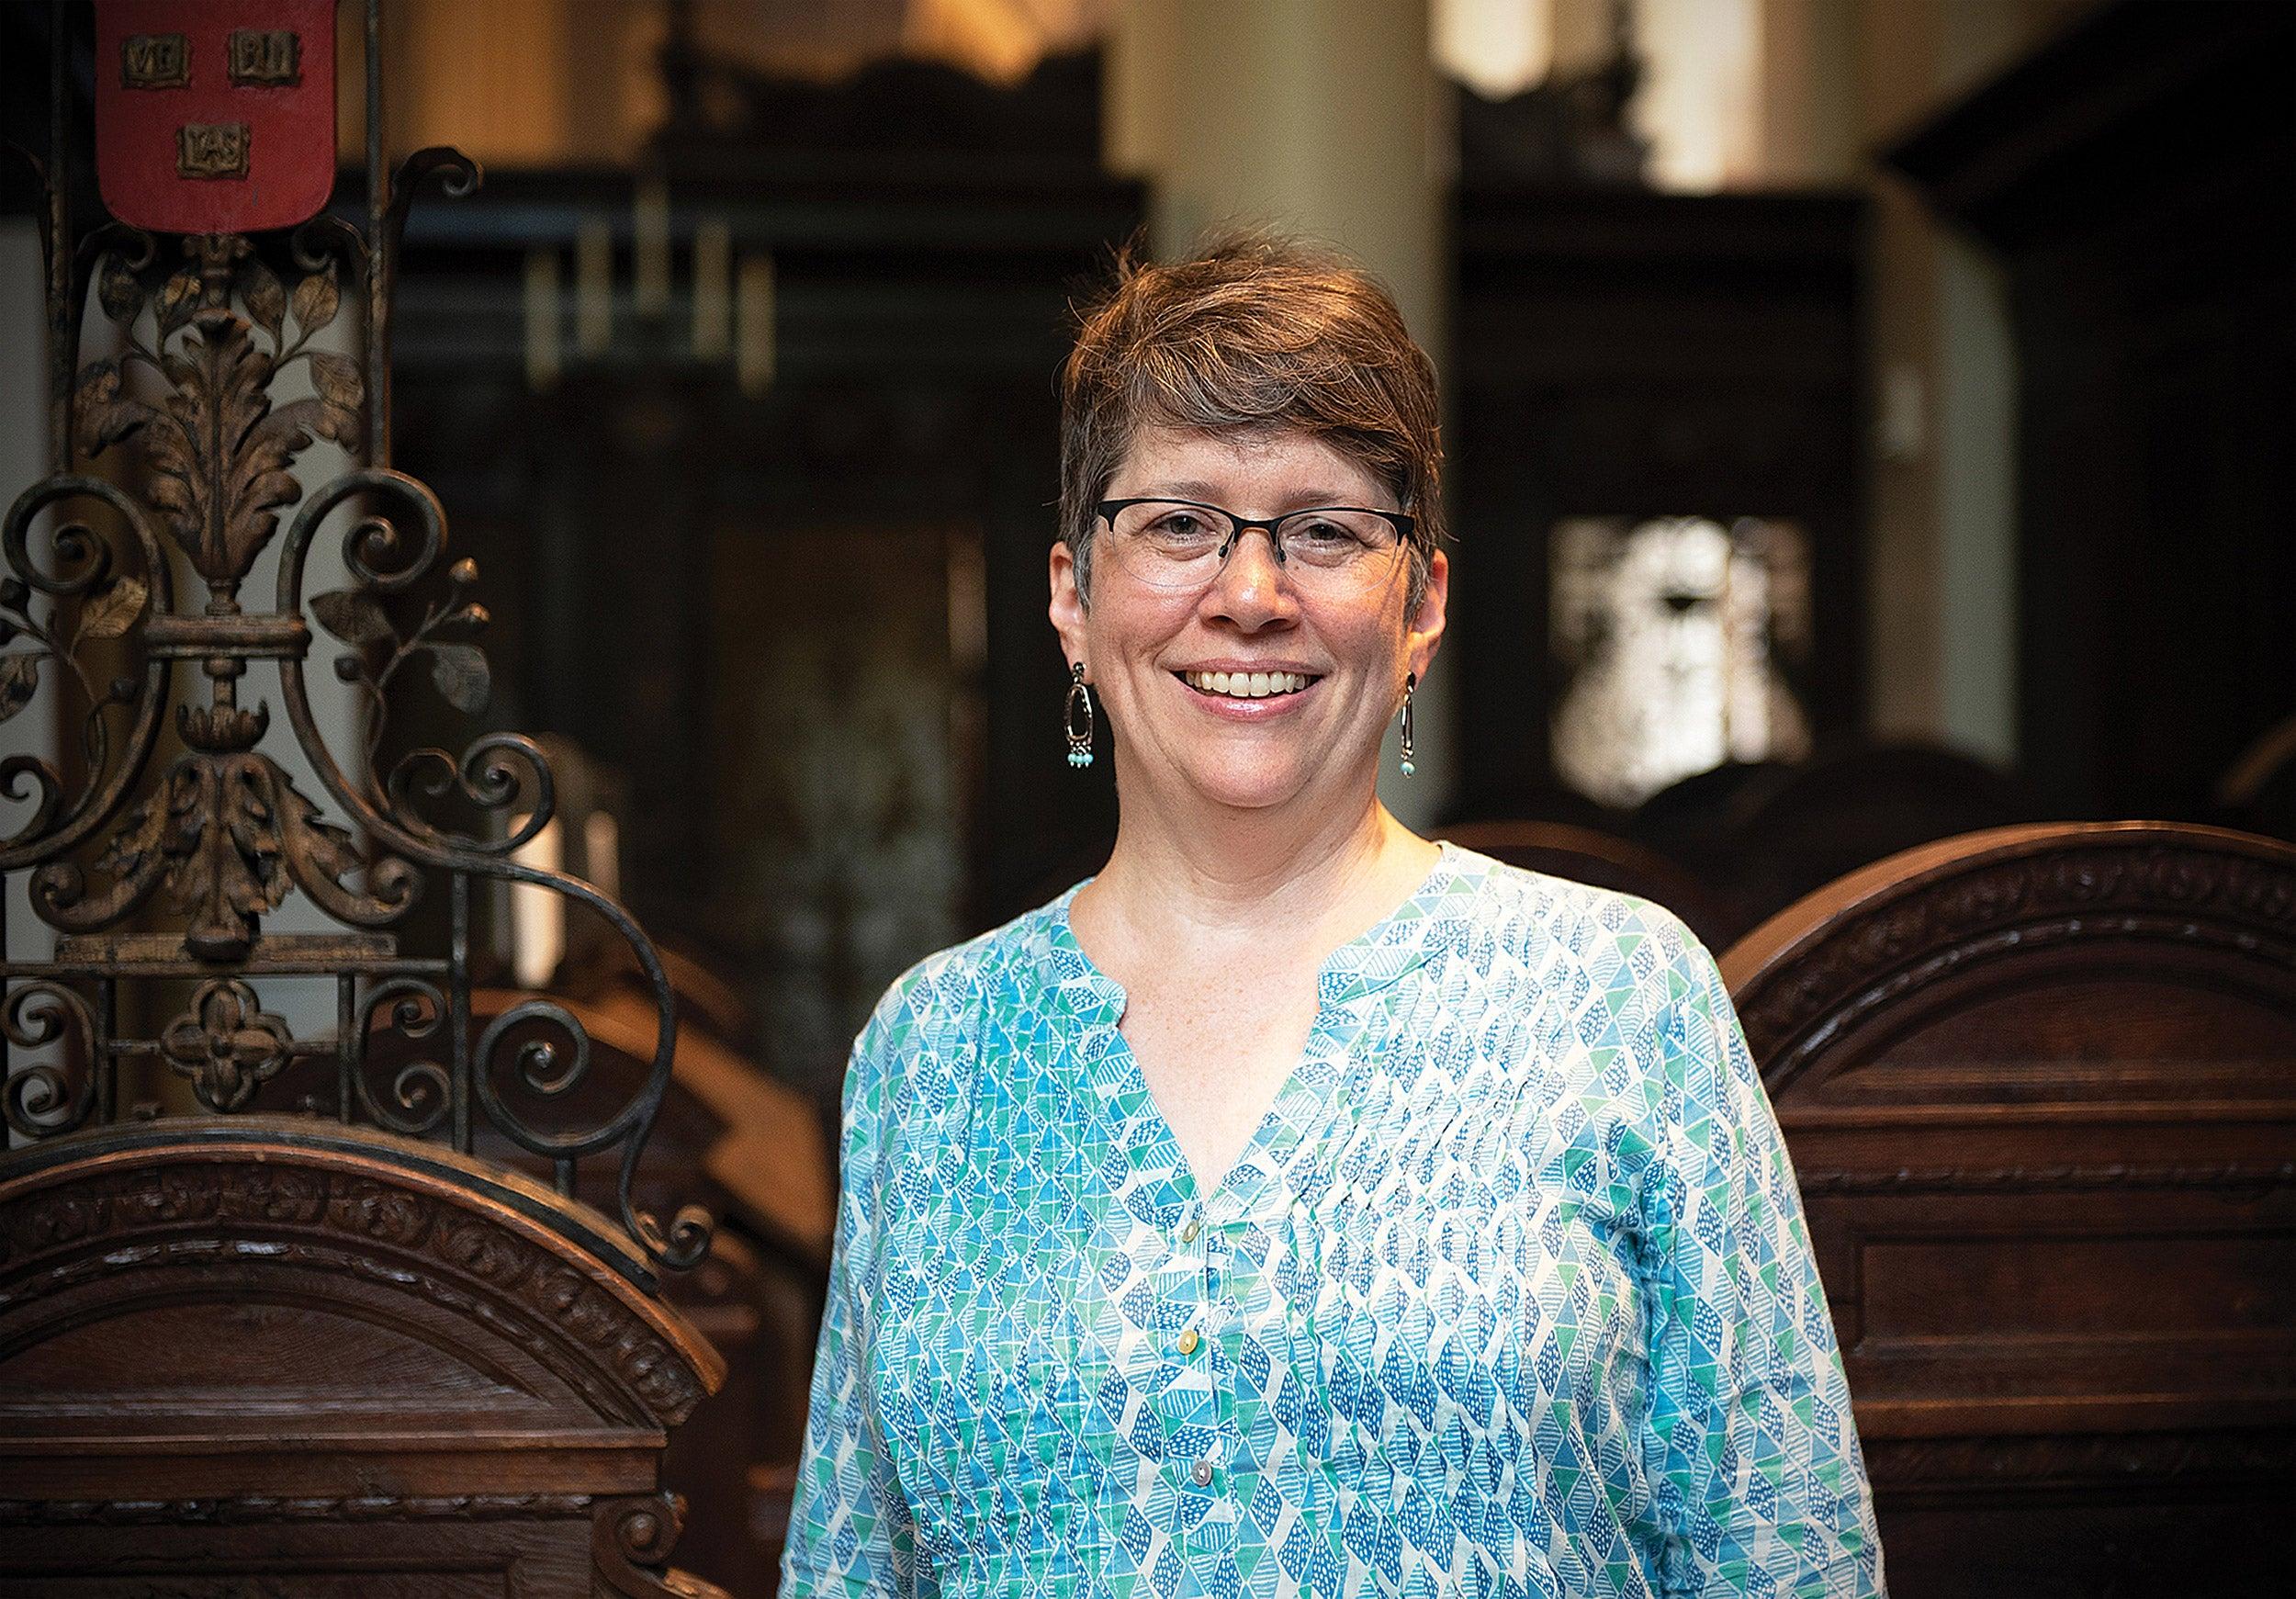 Stephanie Paulsell inside Memorial Church.